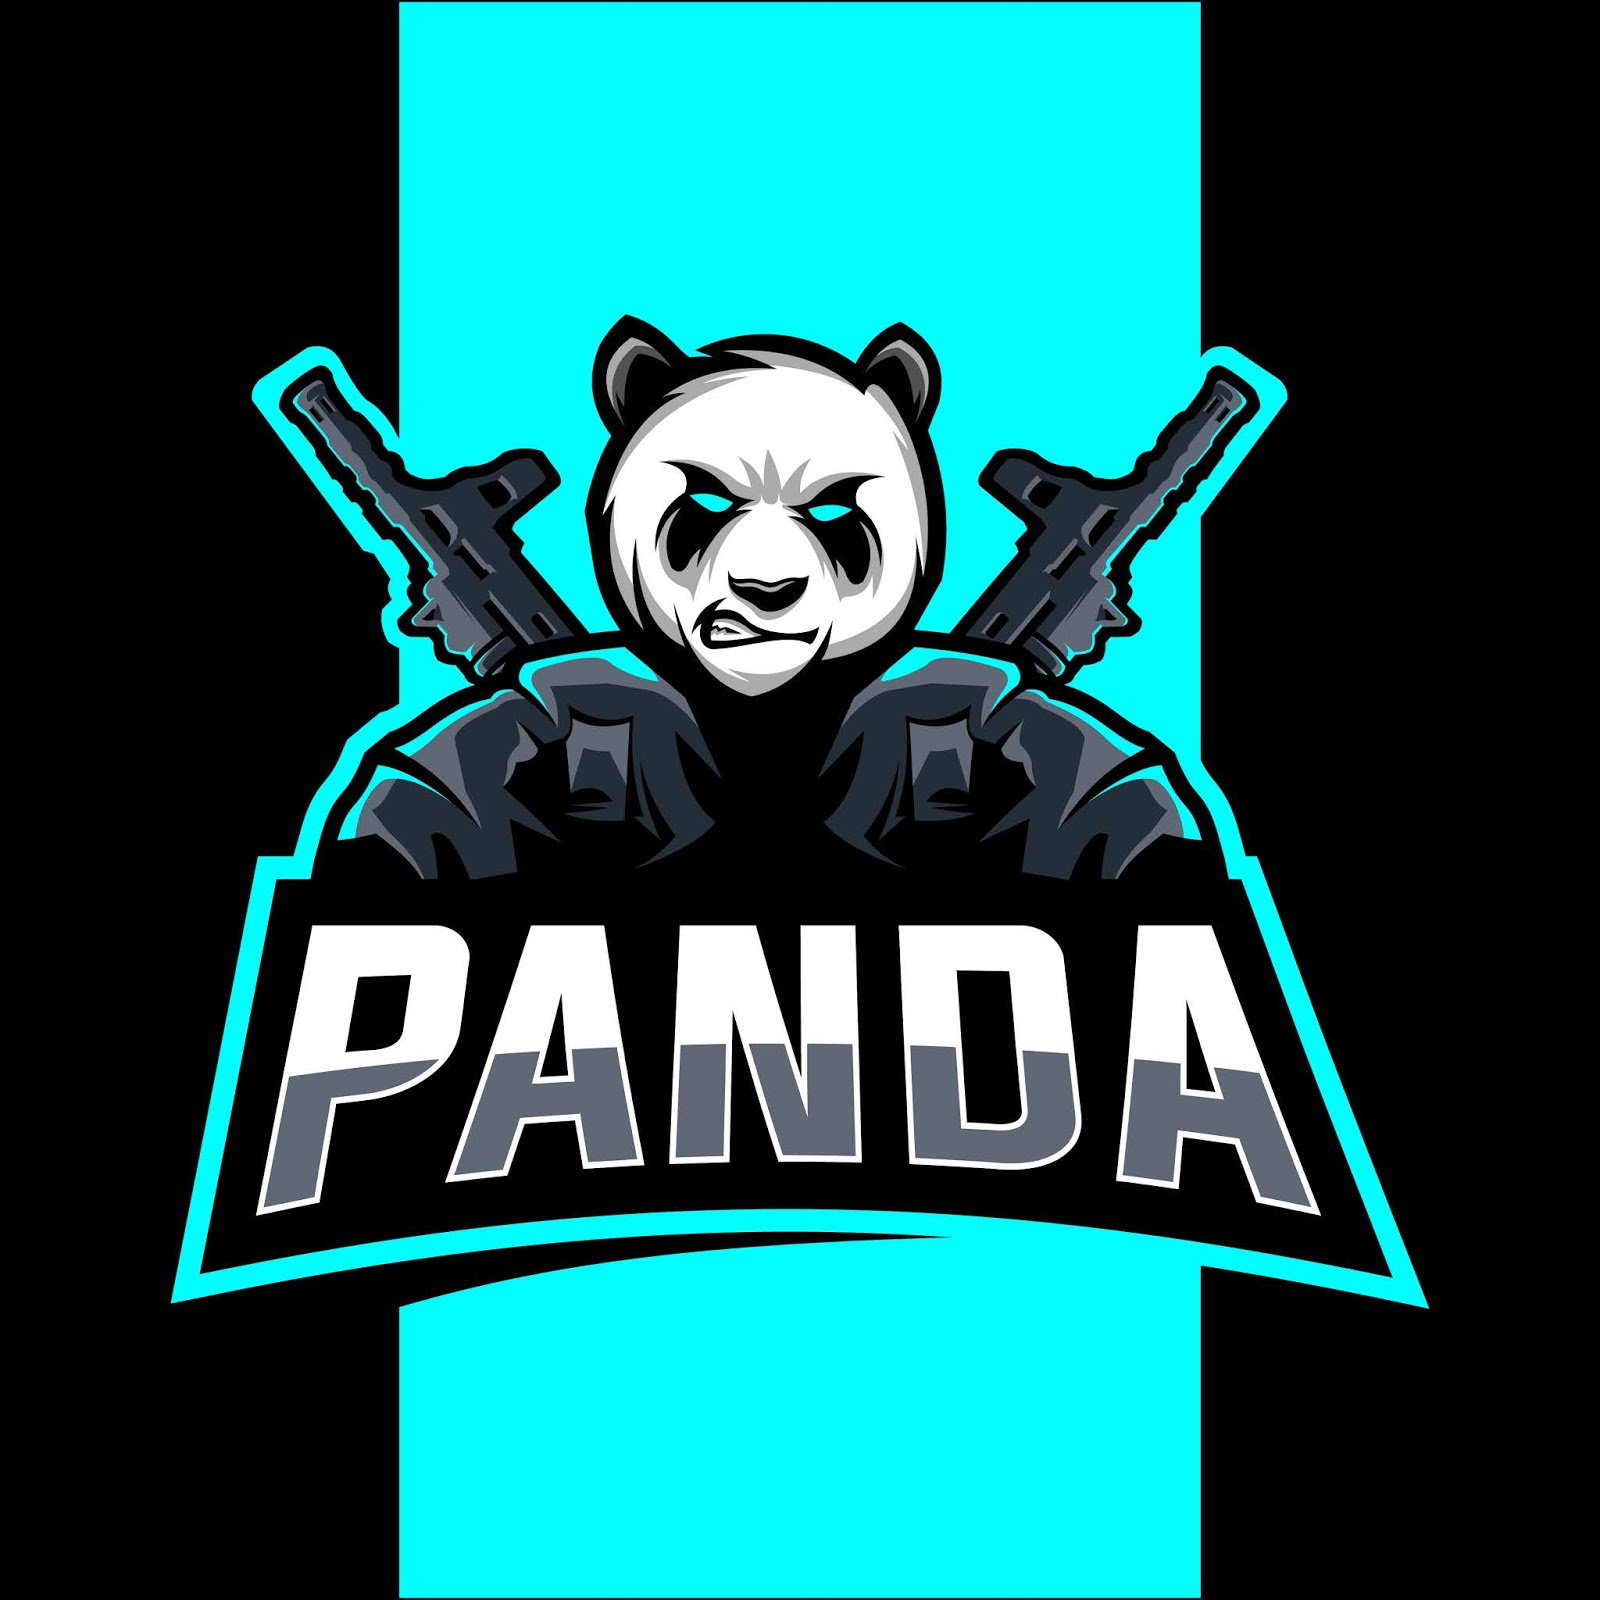 Panda Mascot Esport Logo Funny Free Download Vector CDR, AI, EPS and PNG Formats